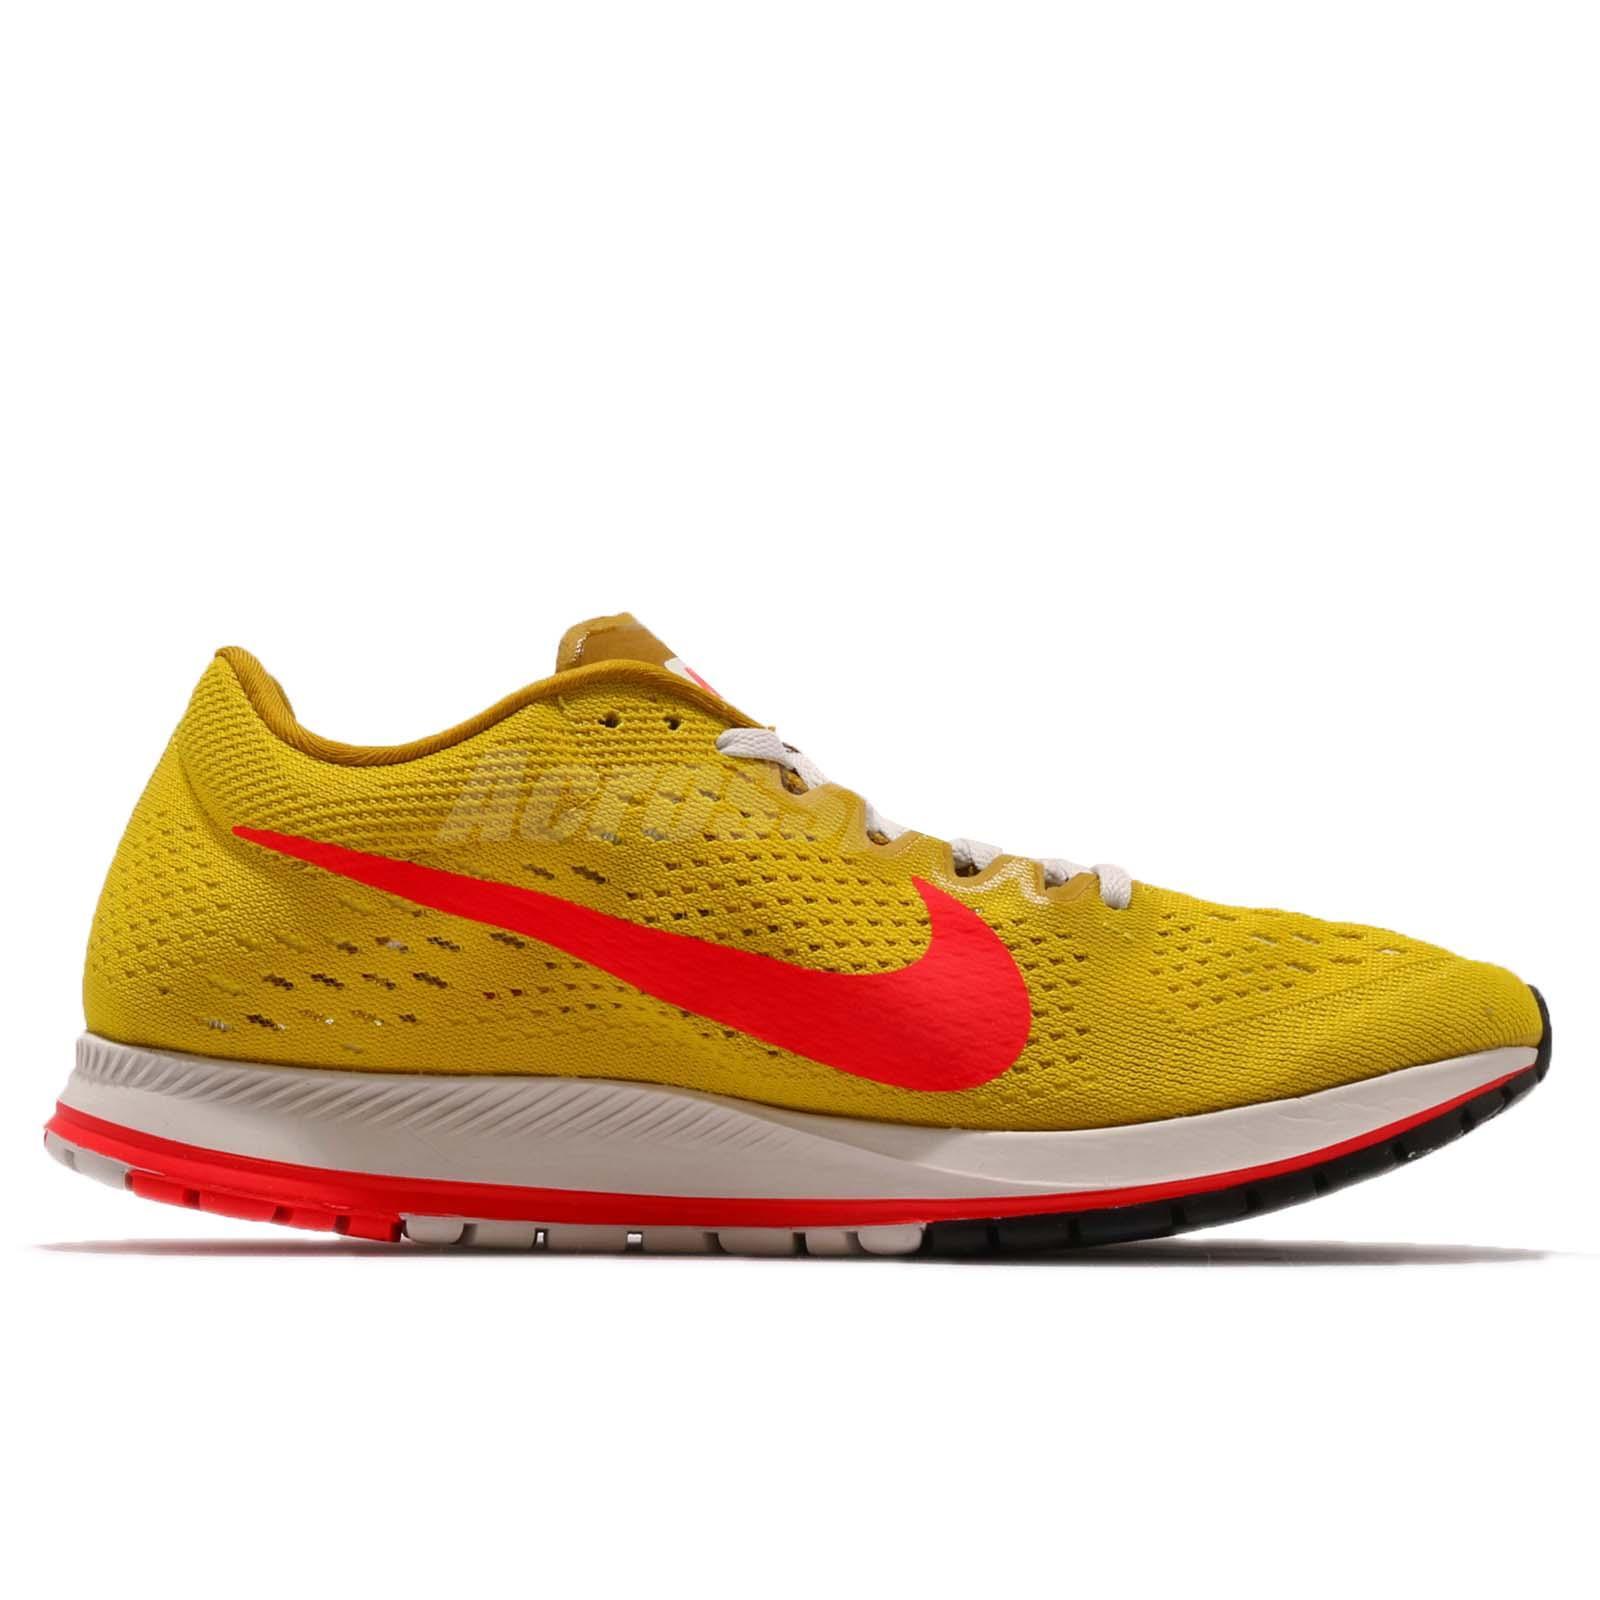 933d5744f9ae Nike Zoom Streak 6 VI Bright Citron Crimson Men Running Shoes ...